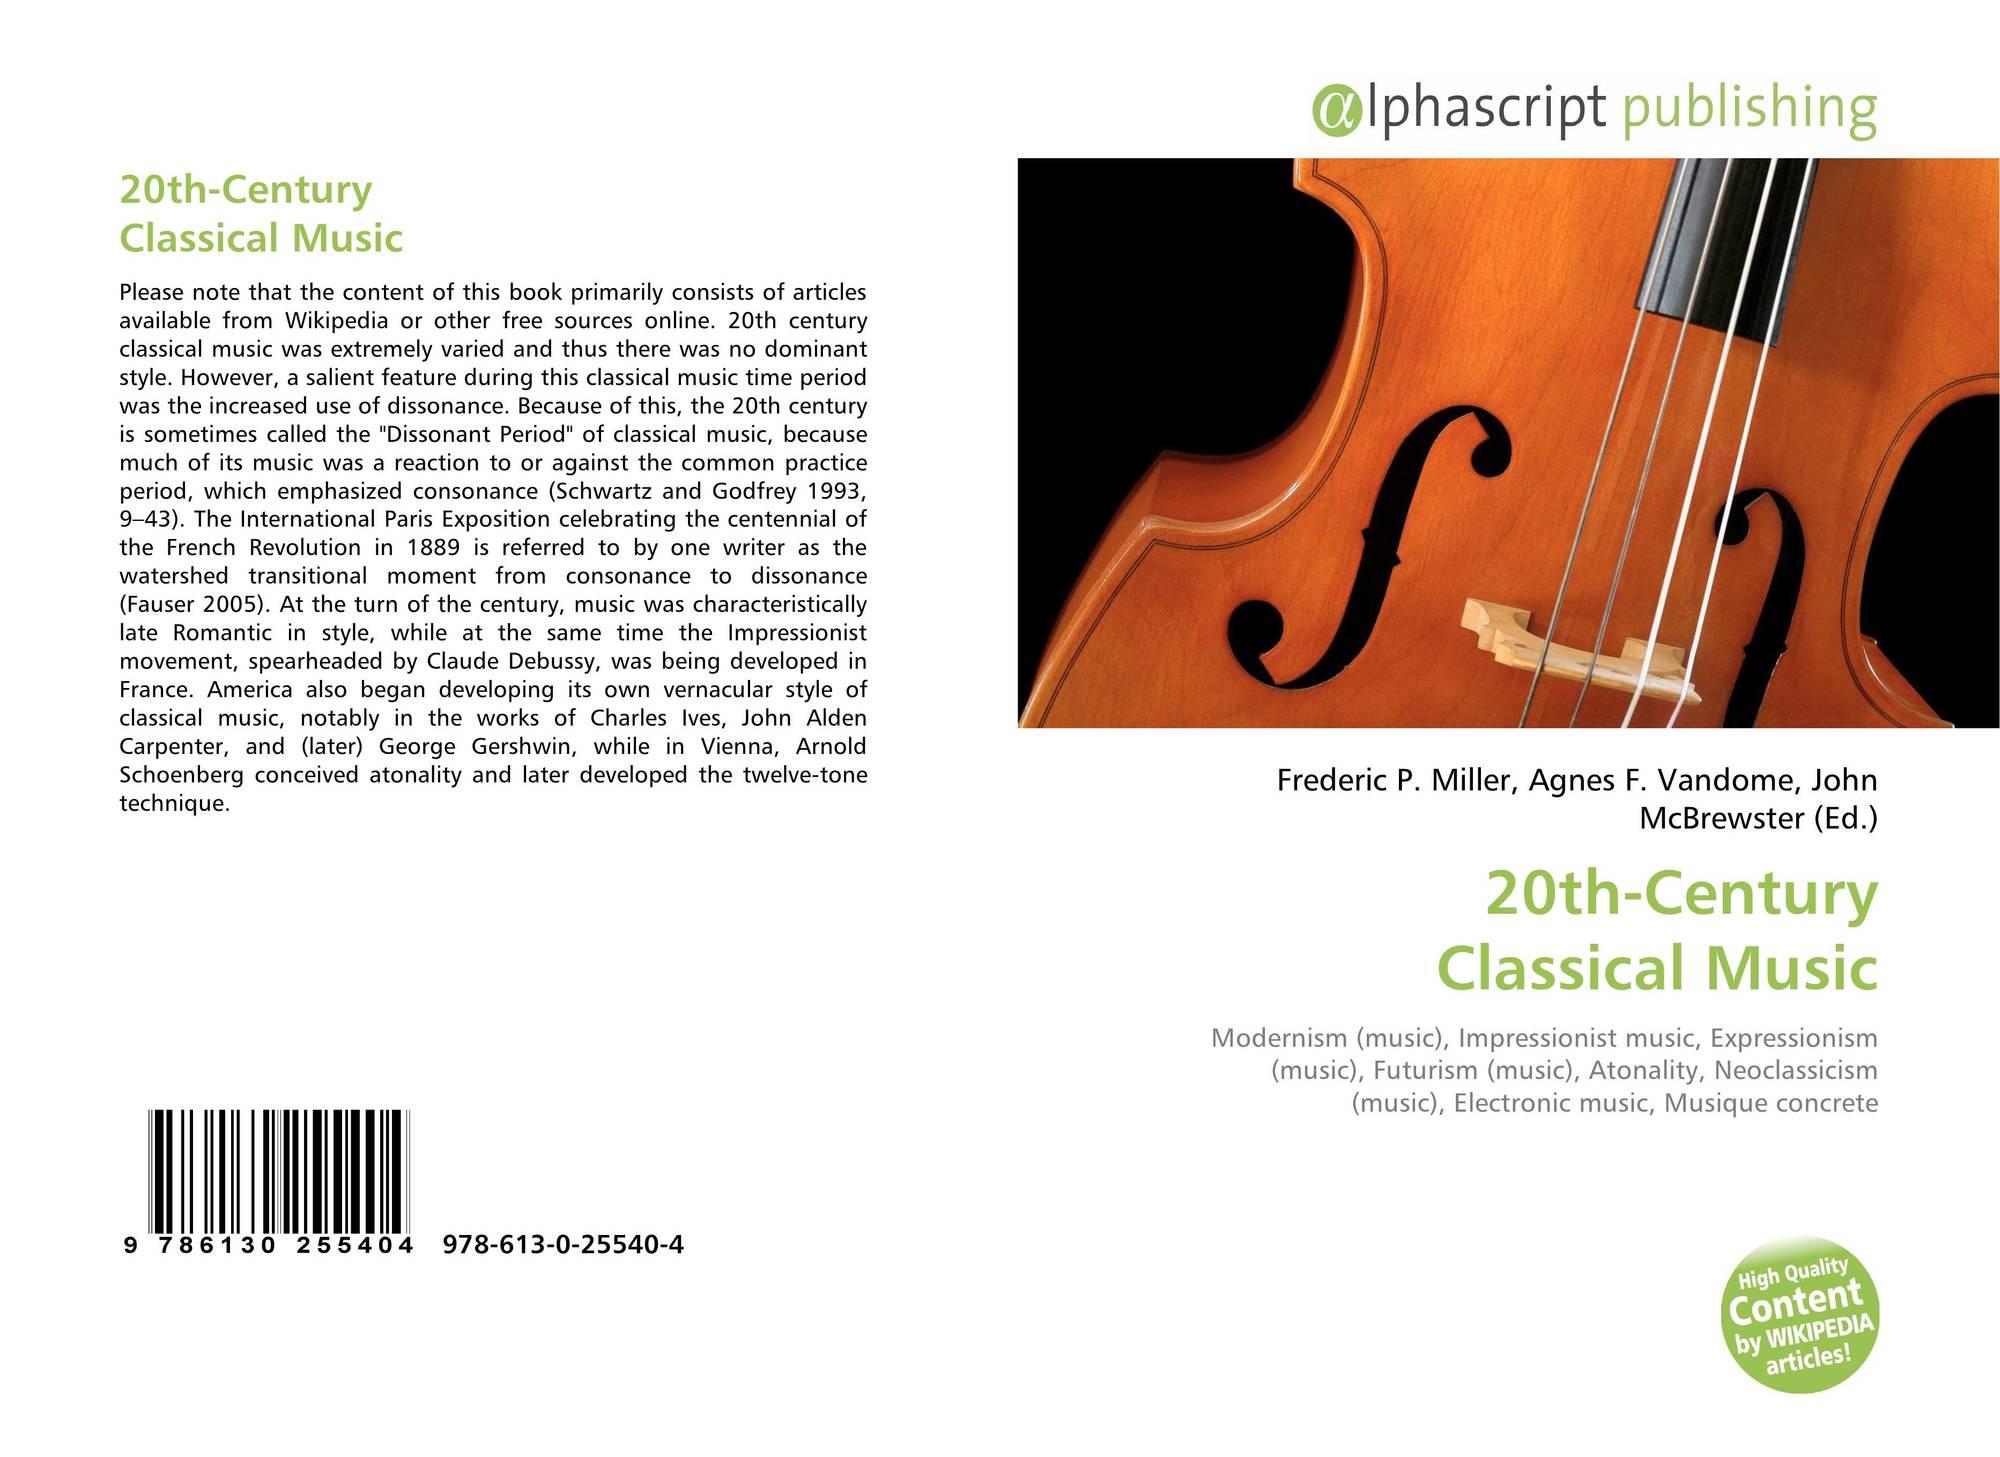 20th-Century Classical Music, ...